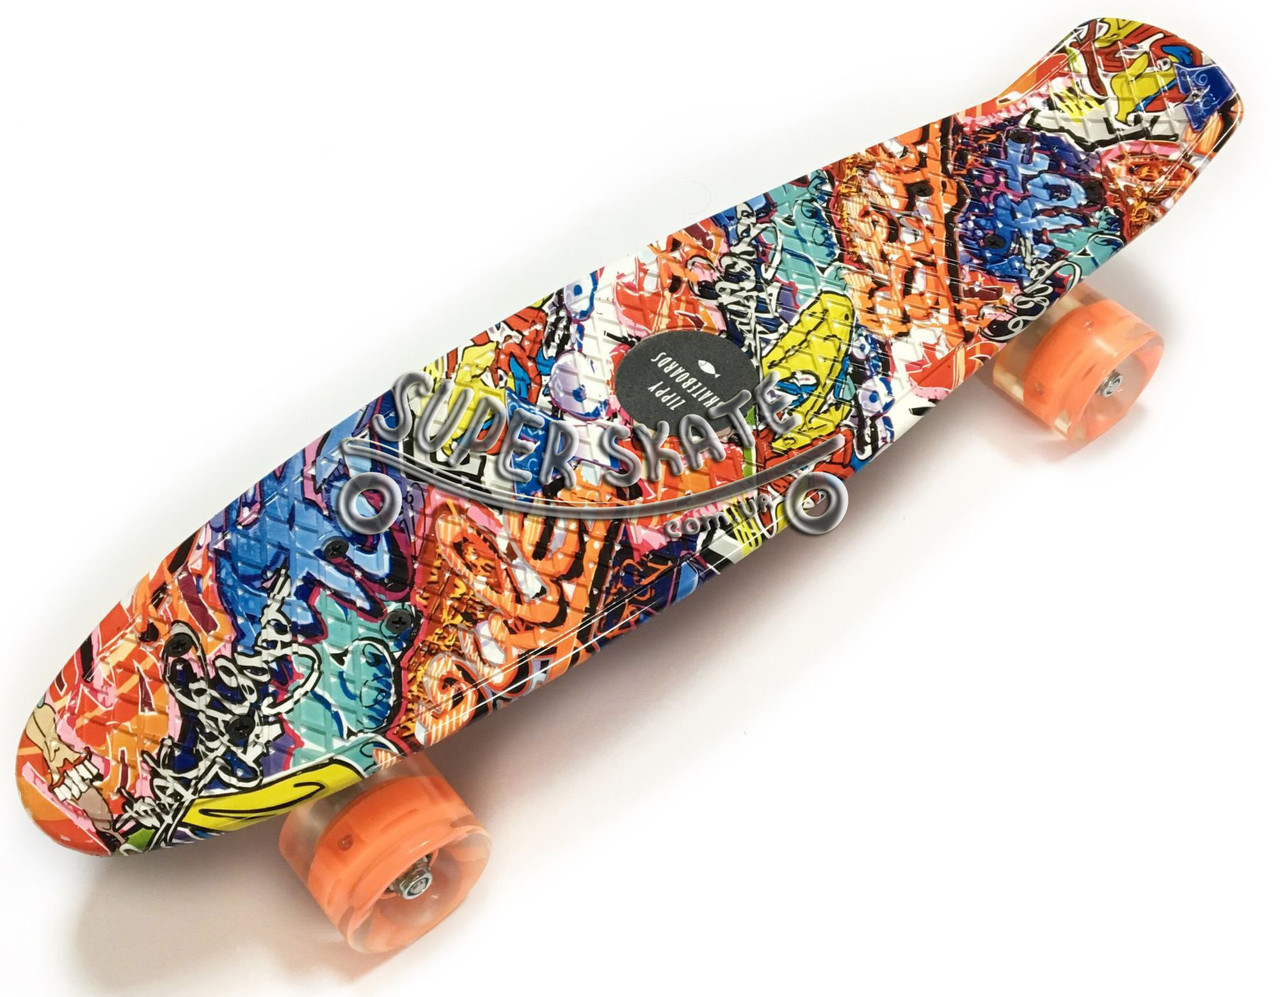 Скейт Пенни борд Penny Board Print Led 22 Graffiti - Граффити 54 см